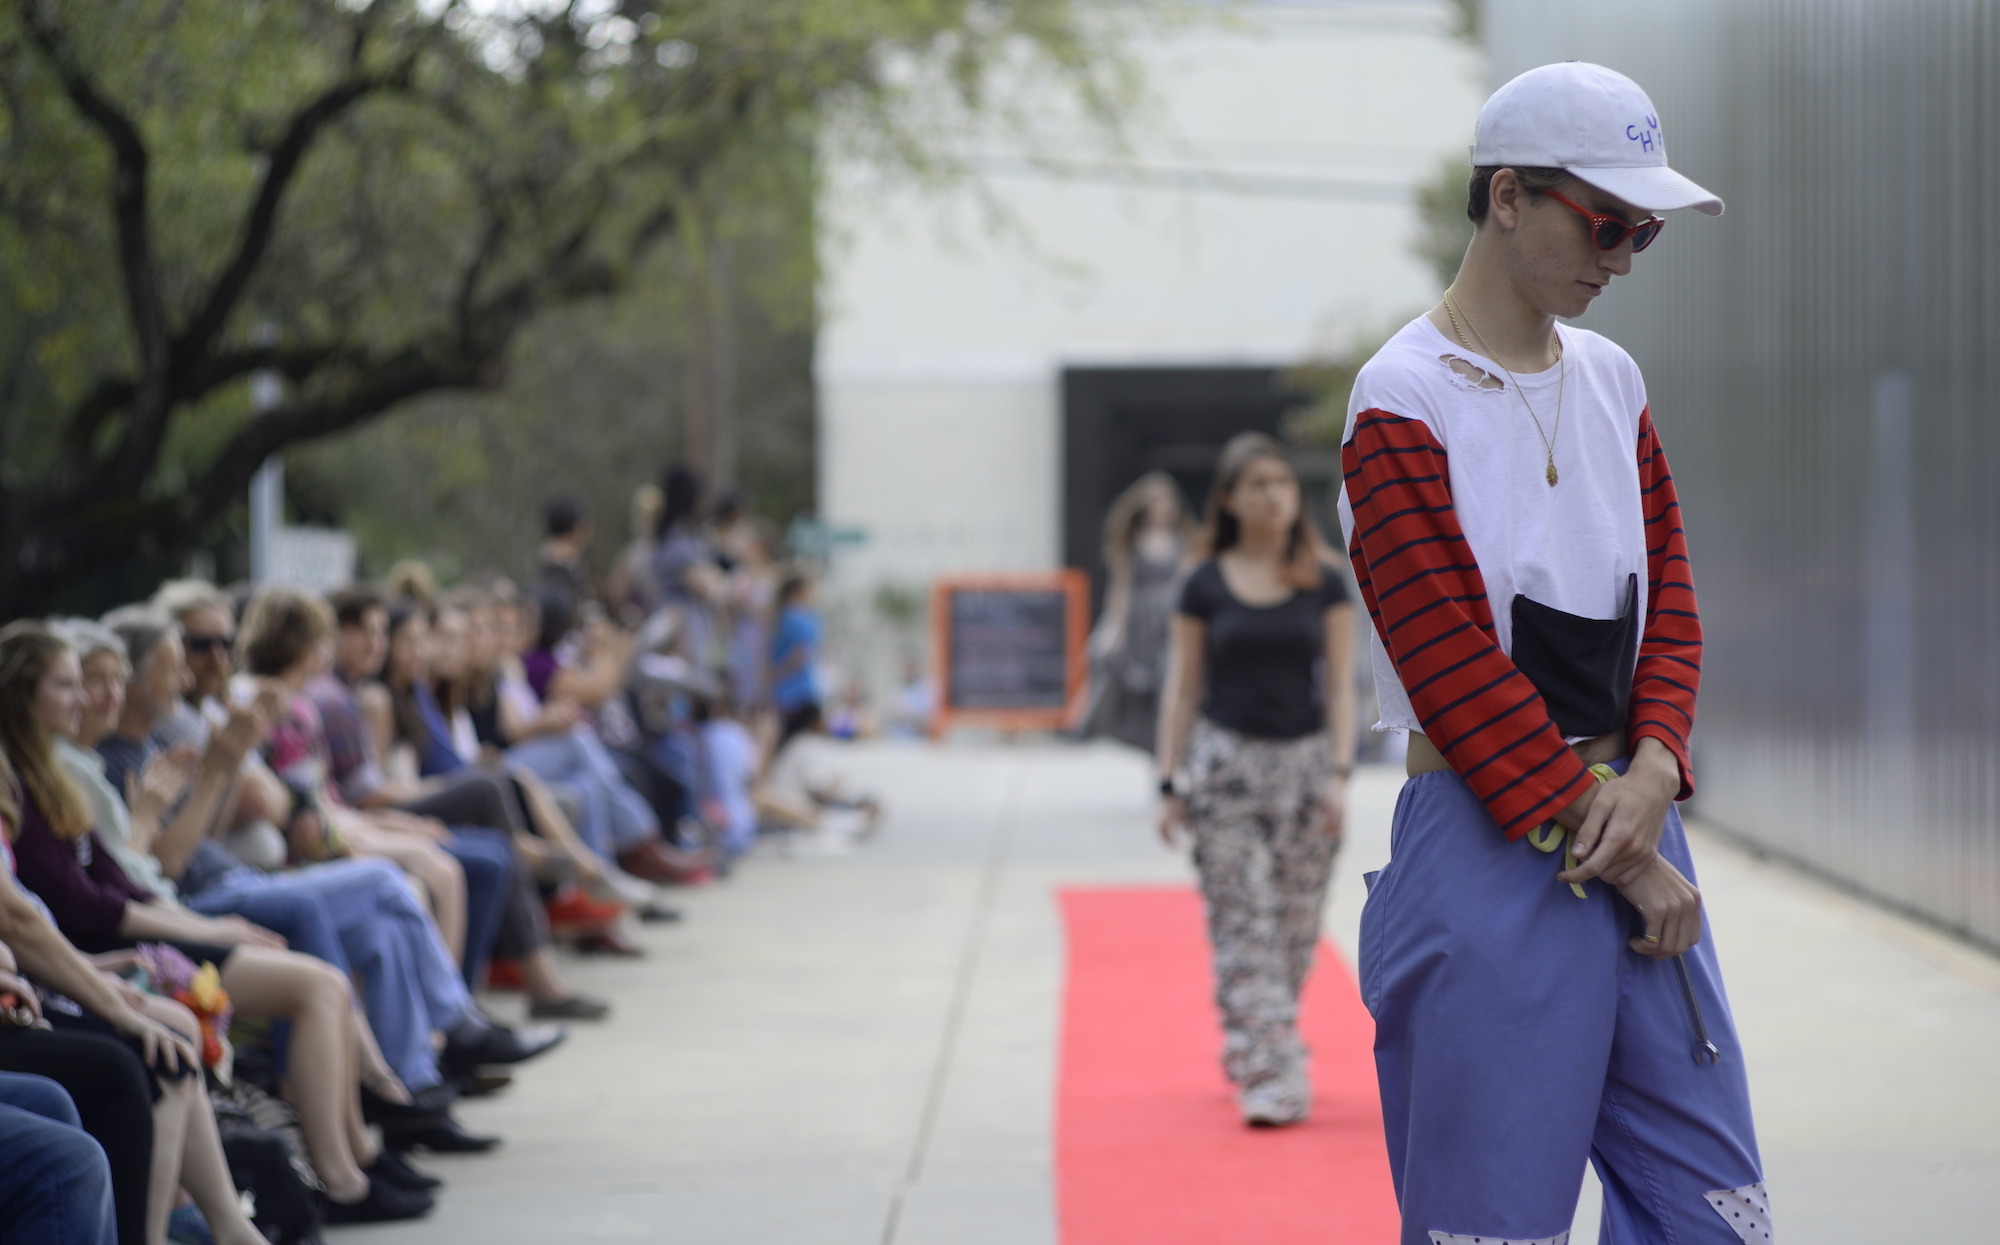 Teen Council Fashion Show 2017. Photo By Ronald L. Jones.